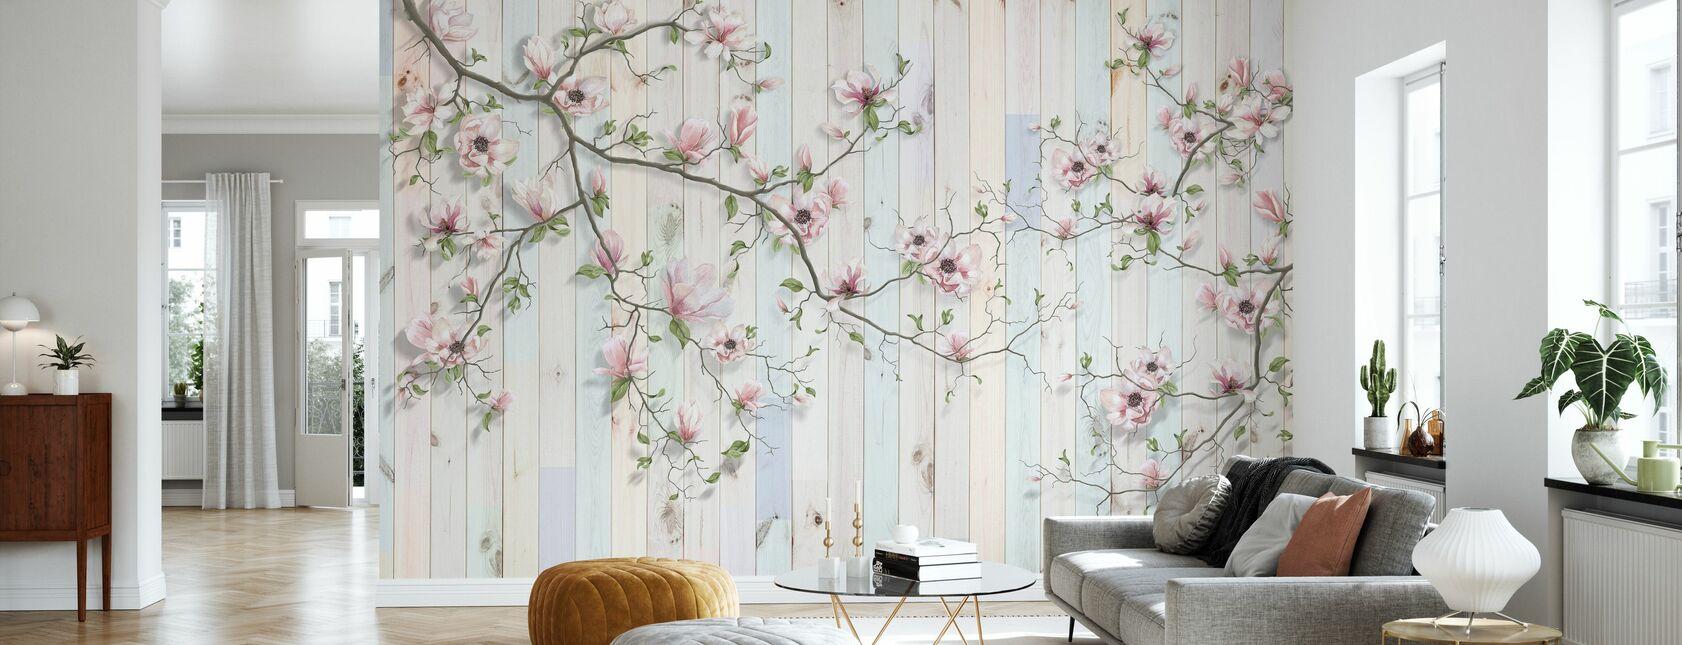 Magnolia Plank Wall - Wallpaper - Living Room